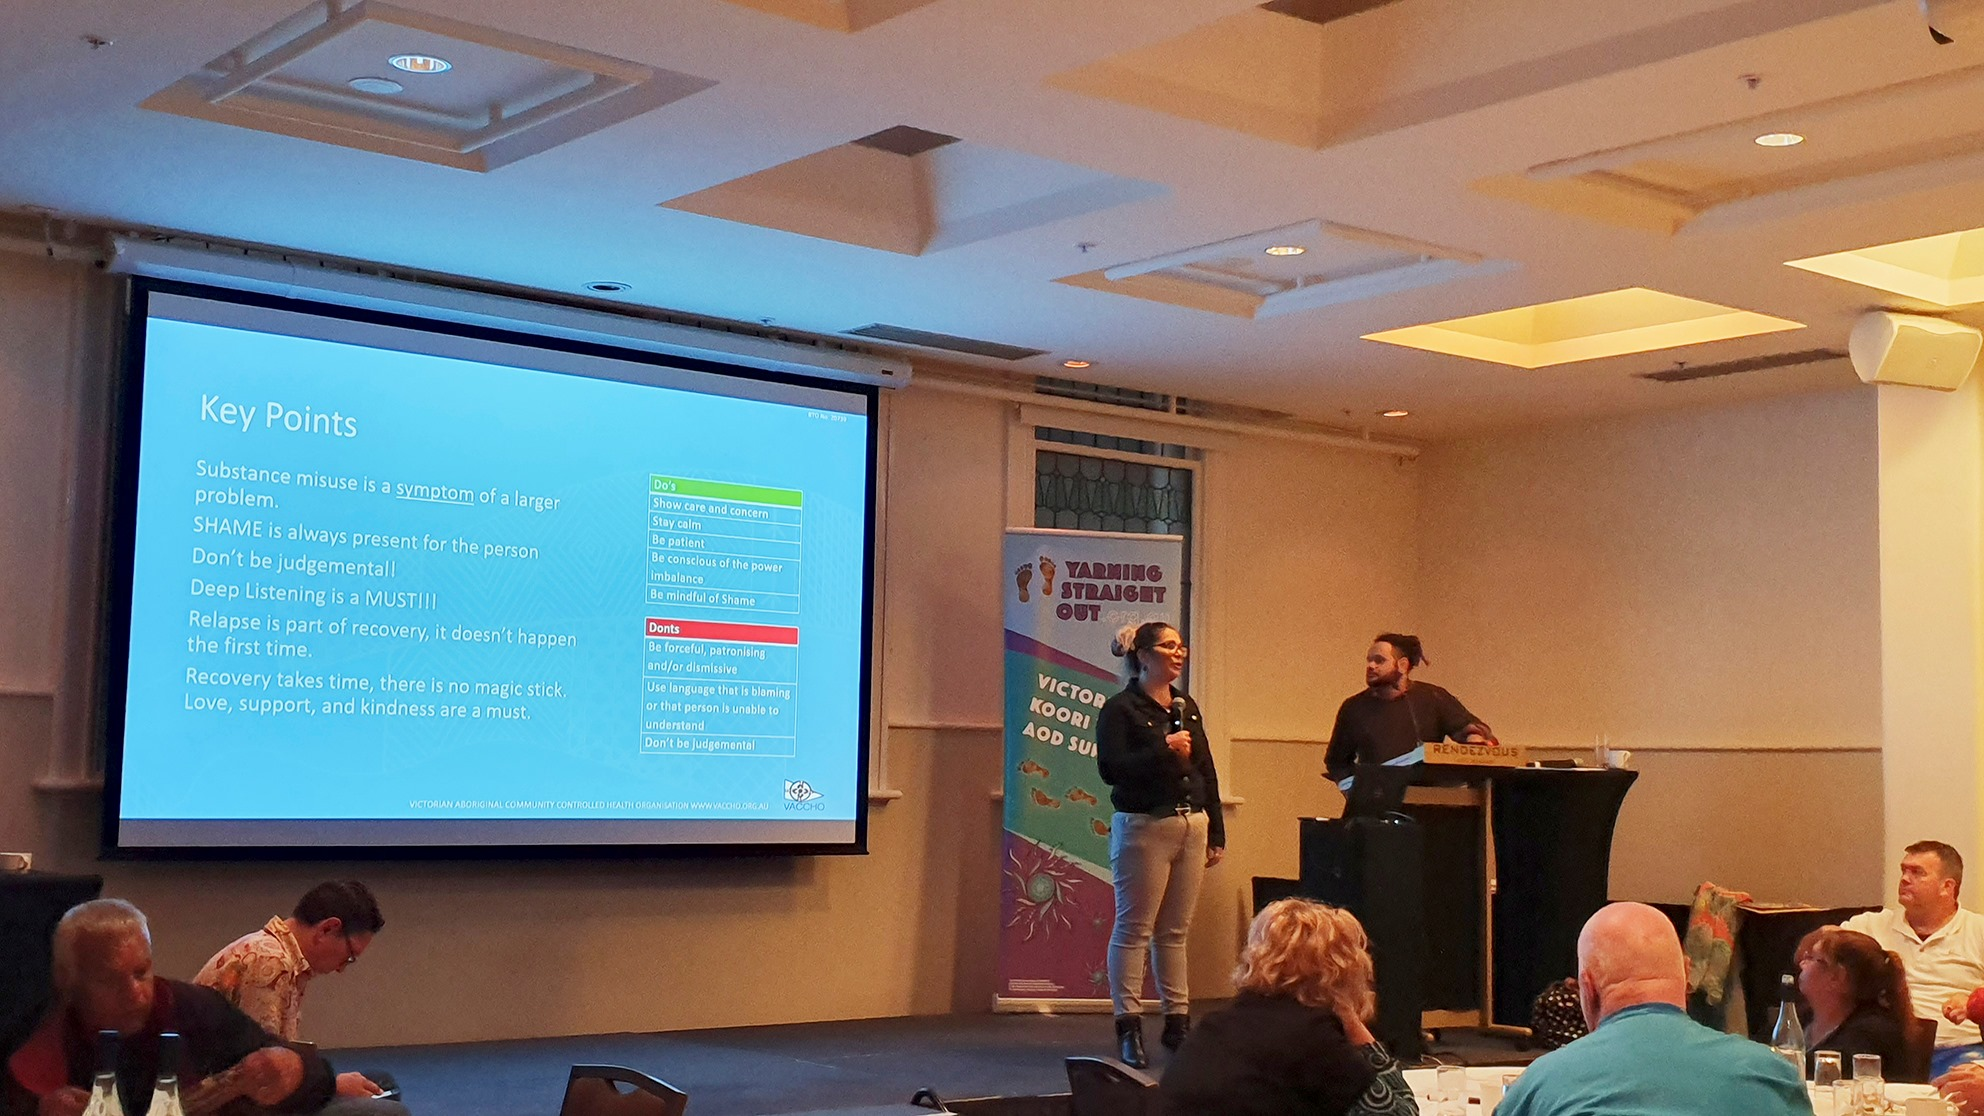 NACCHO Our Members #Aboriginal Health Deadly Good News Stories : Features National @NACCHOChair @KenWyattMP #NSW @ahmrc #RedfernAMS #KatungulACCHO#VIC @VACCHO_org #QLD @QAIHC_QLD @DeadlyChoices #WA @TheAHCWA #WirrakaMayaACCHO #NT @CAACongress